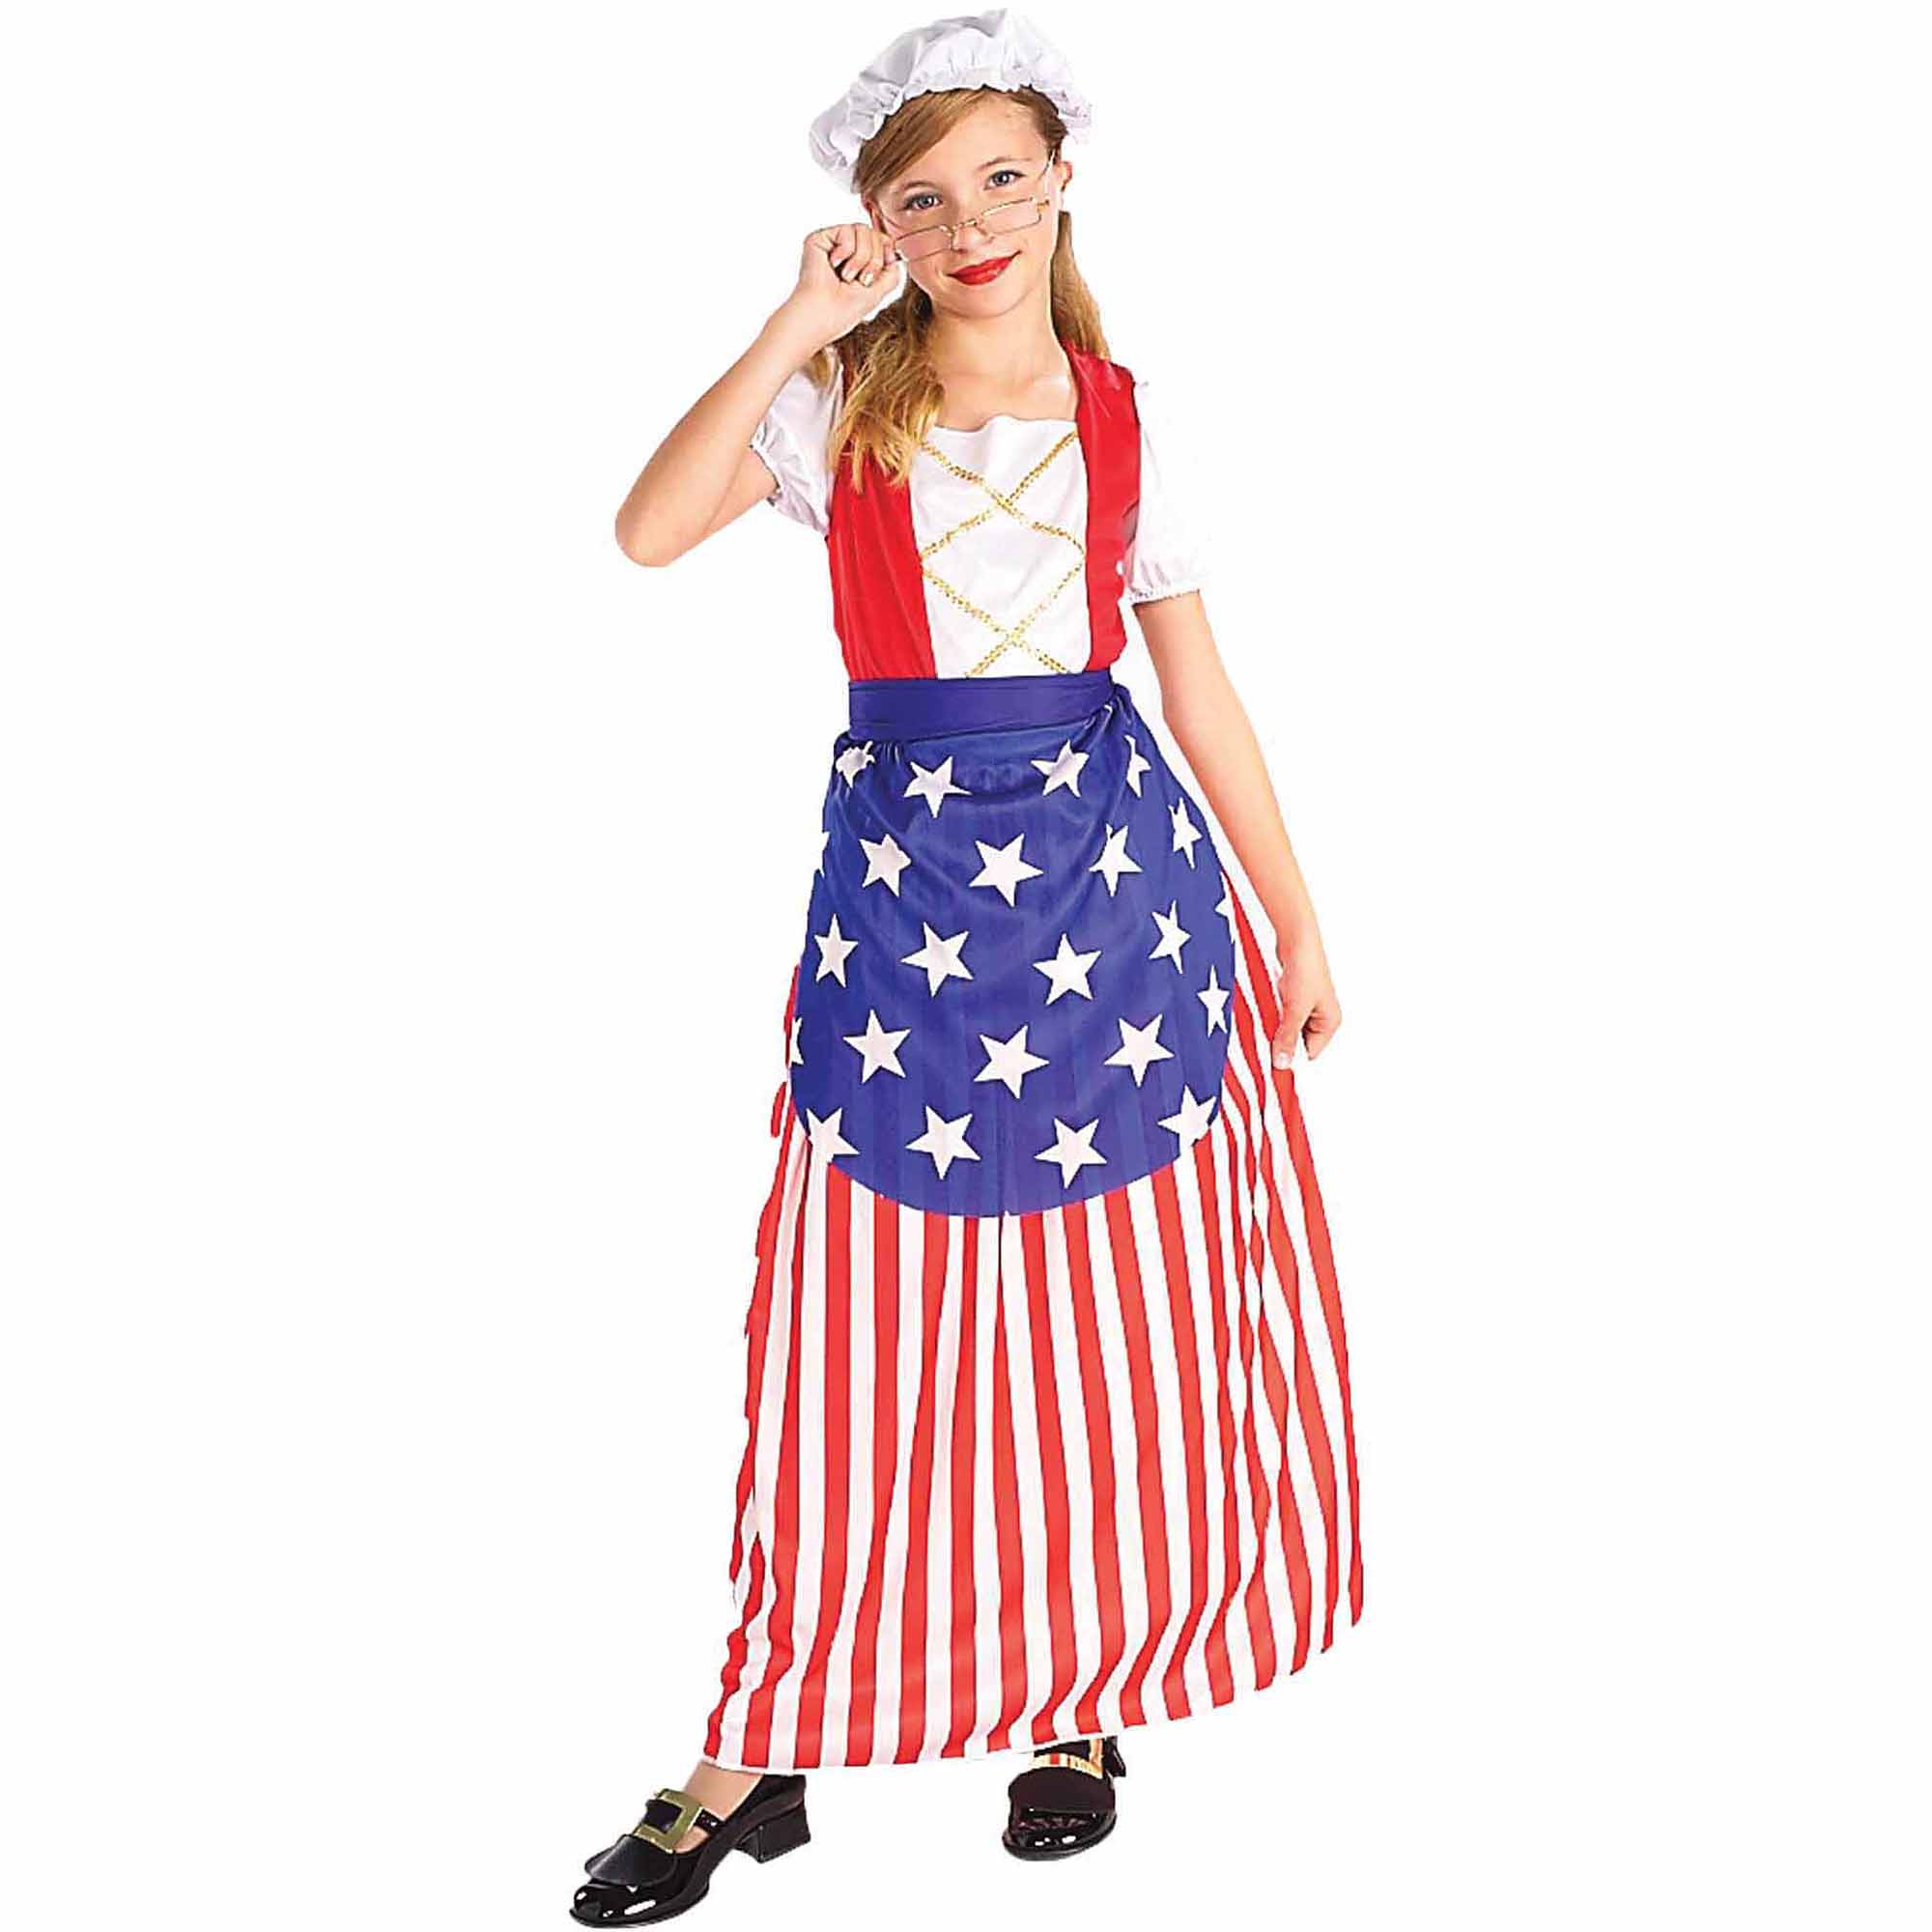 Betsy Ross Child Halloween Costume - Walmart.com